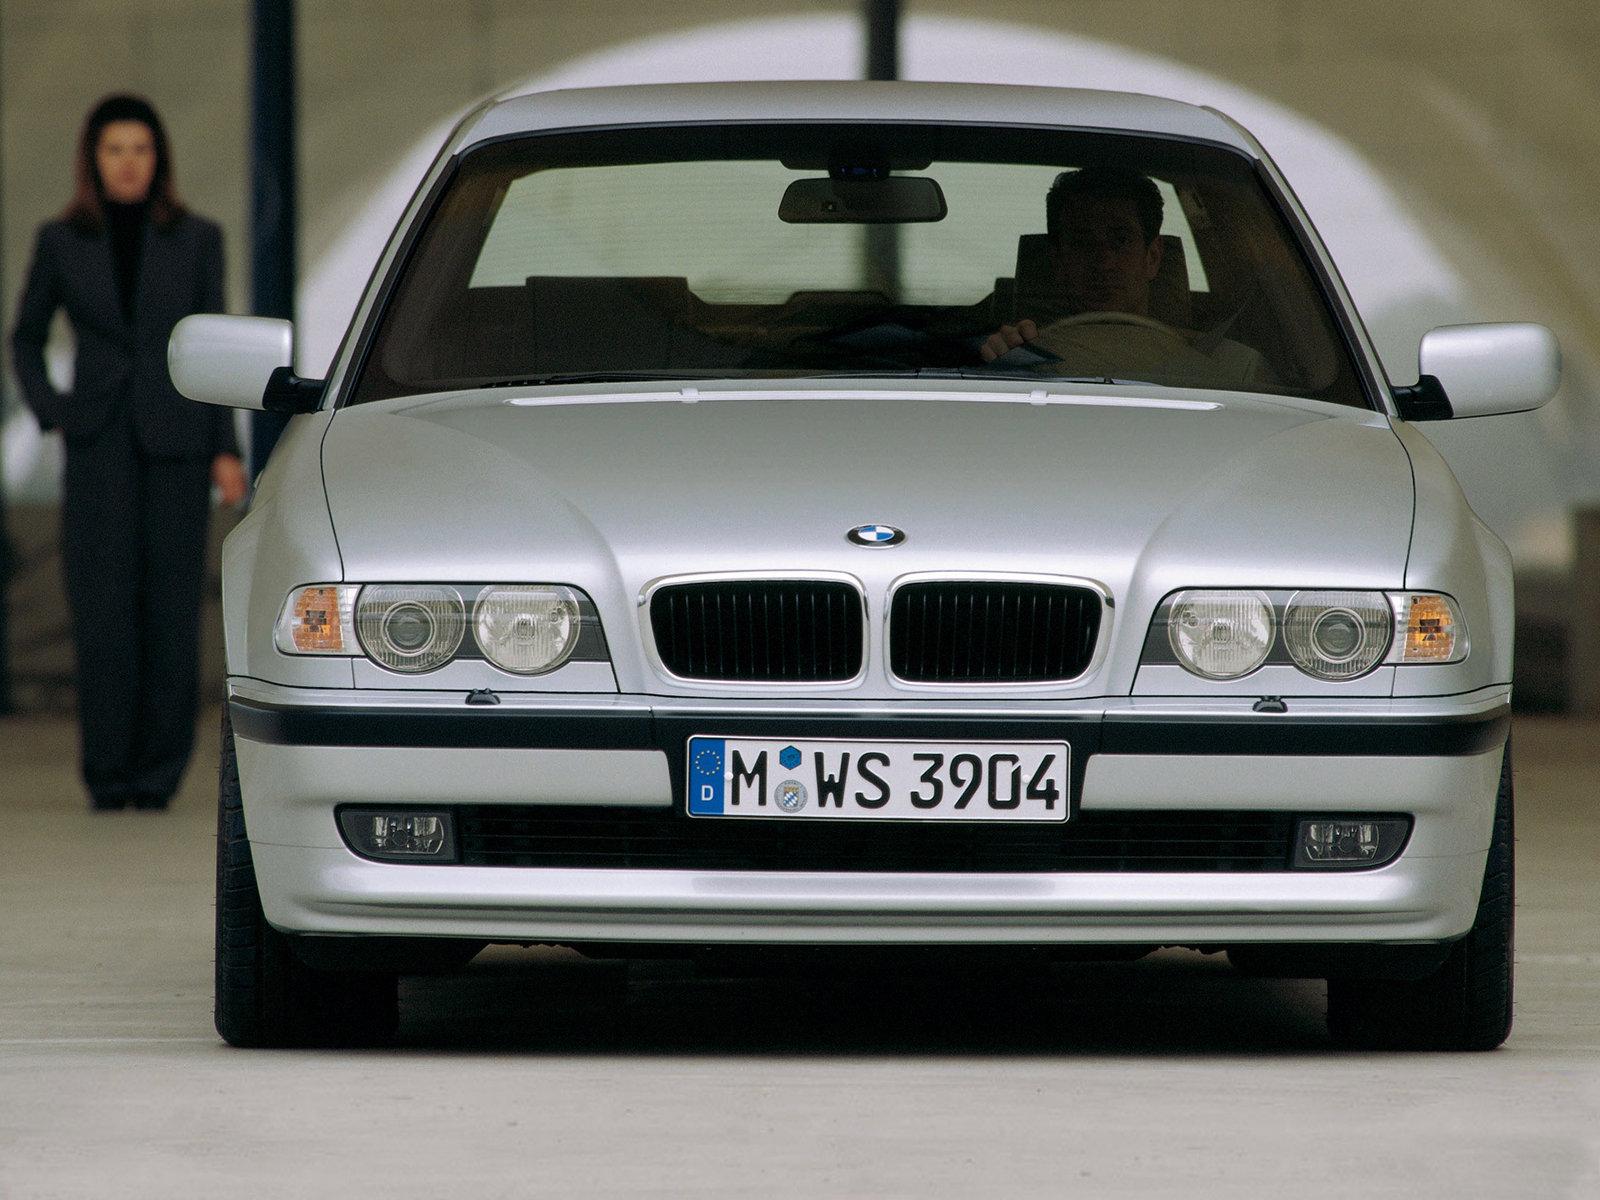 2019 - [BMW] Série 7 restylée  - Page 4 Bmw-e38-1195sm